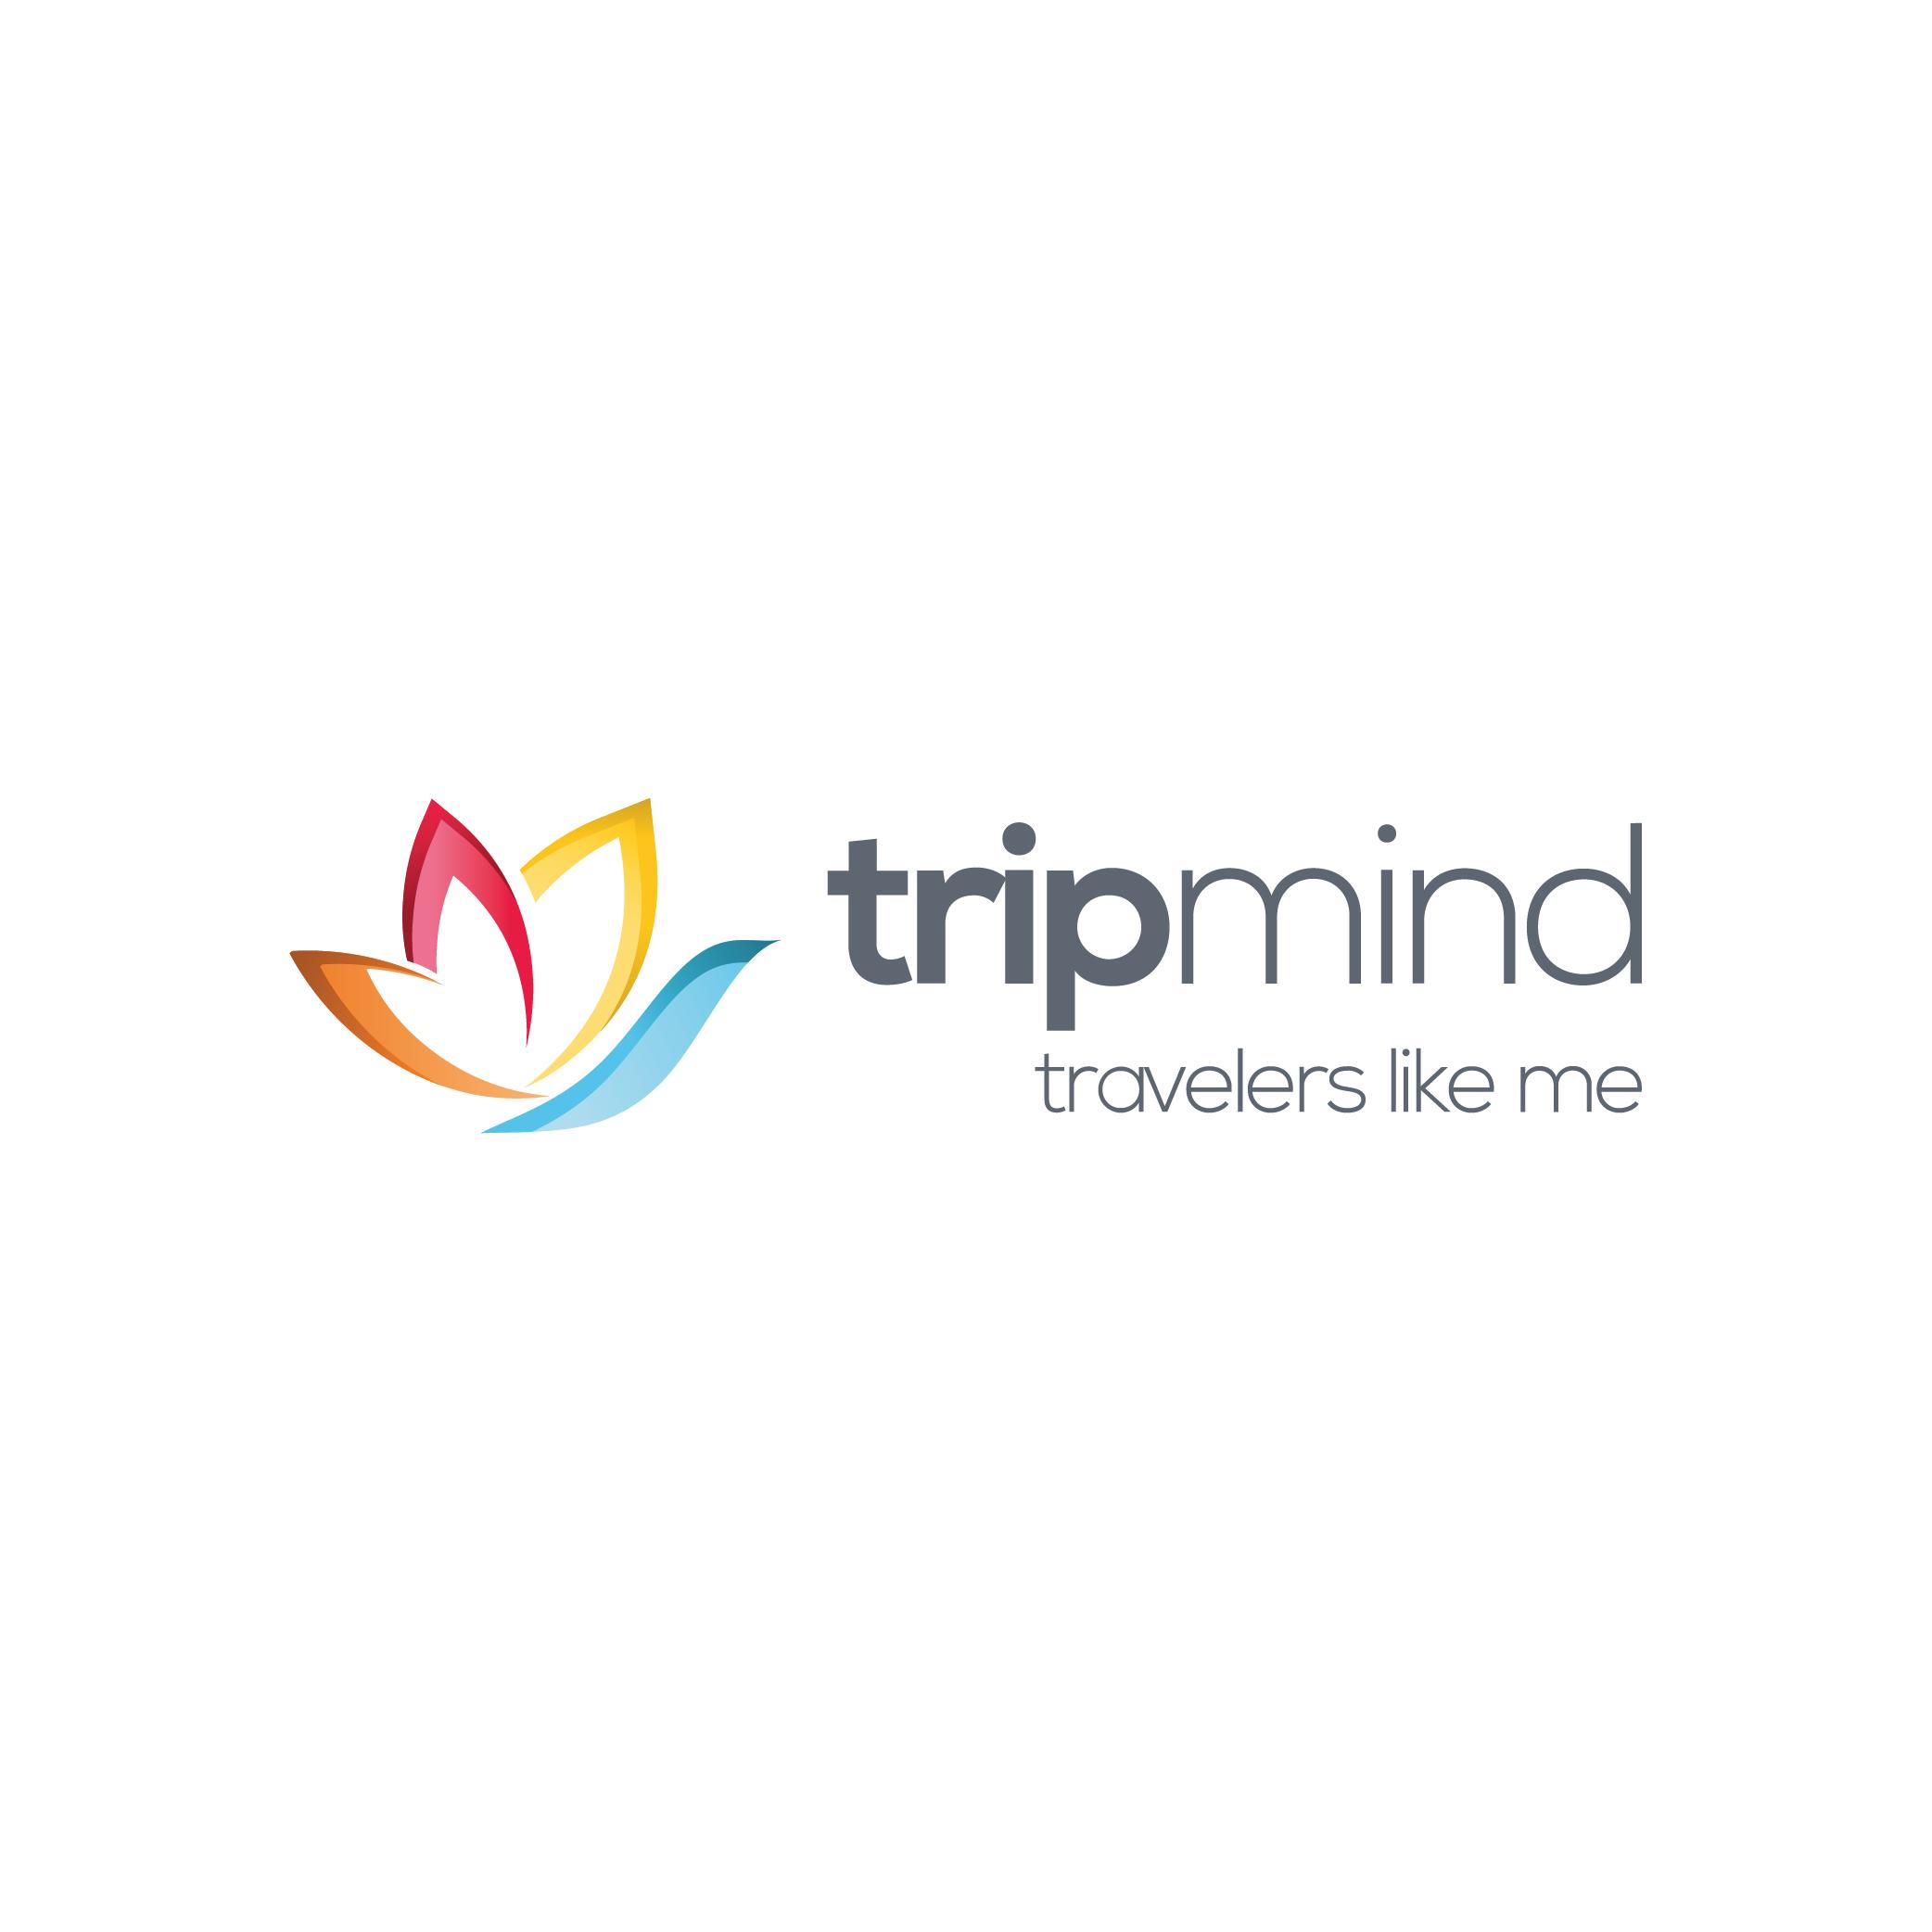 tripmind